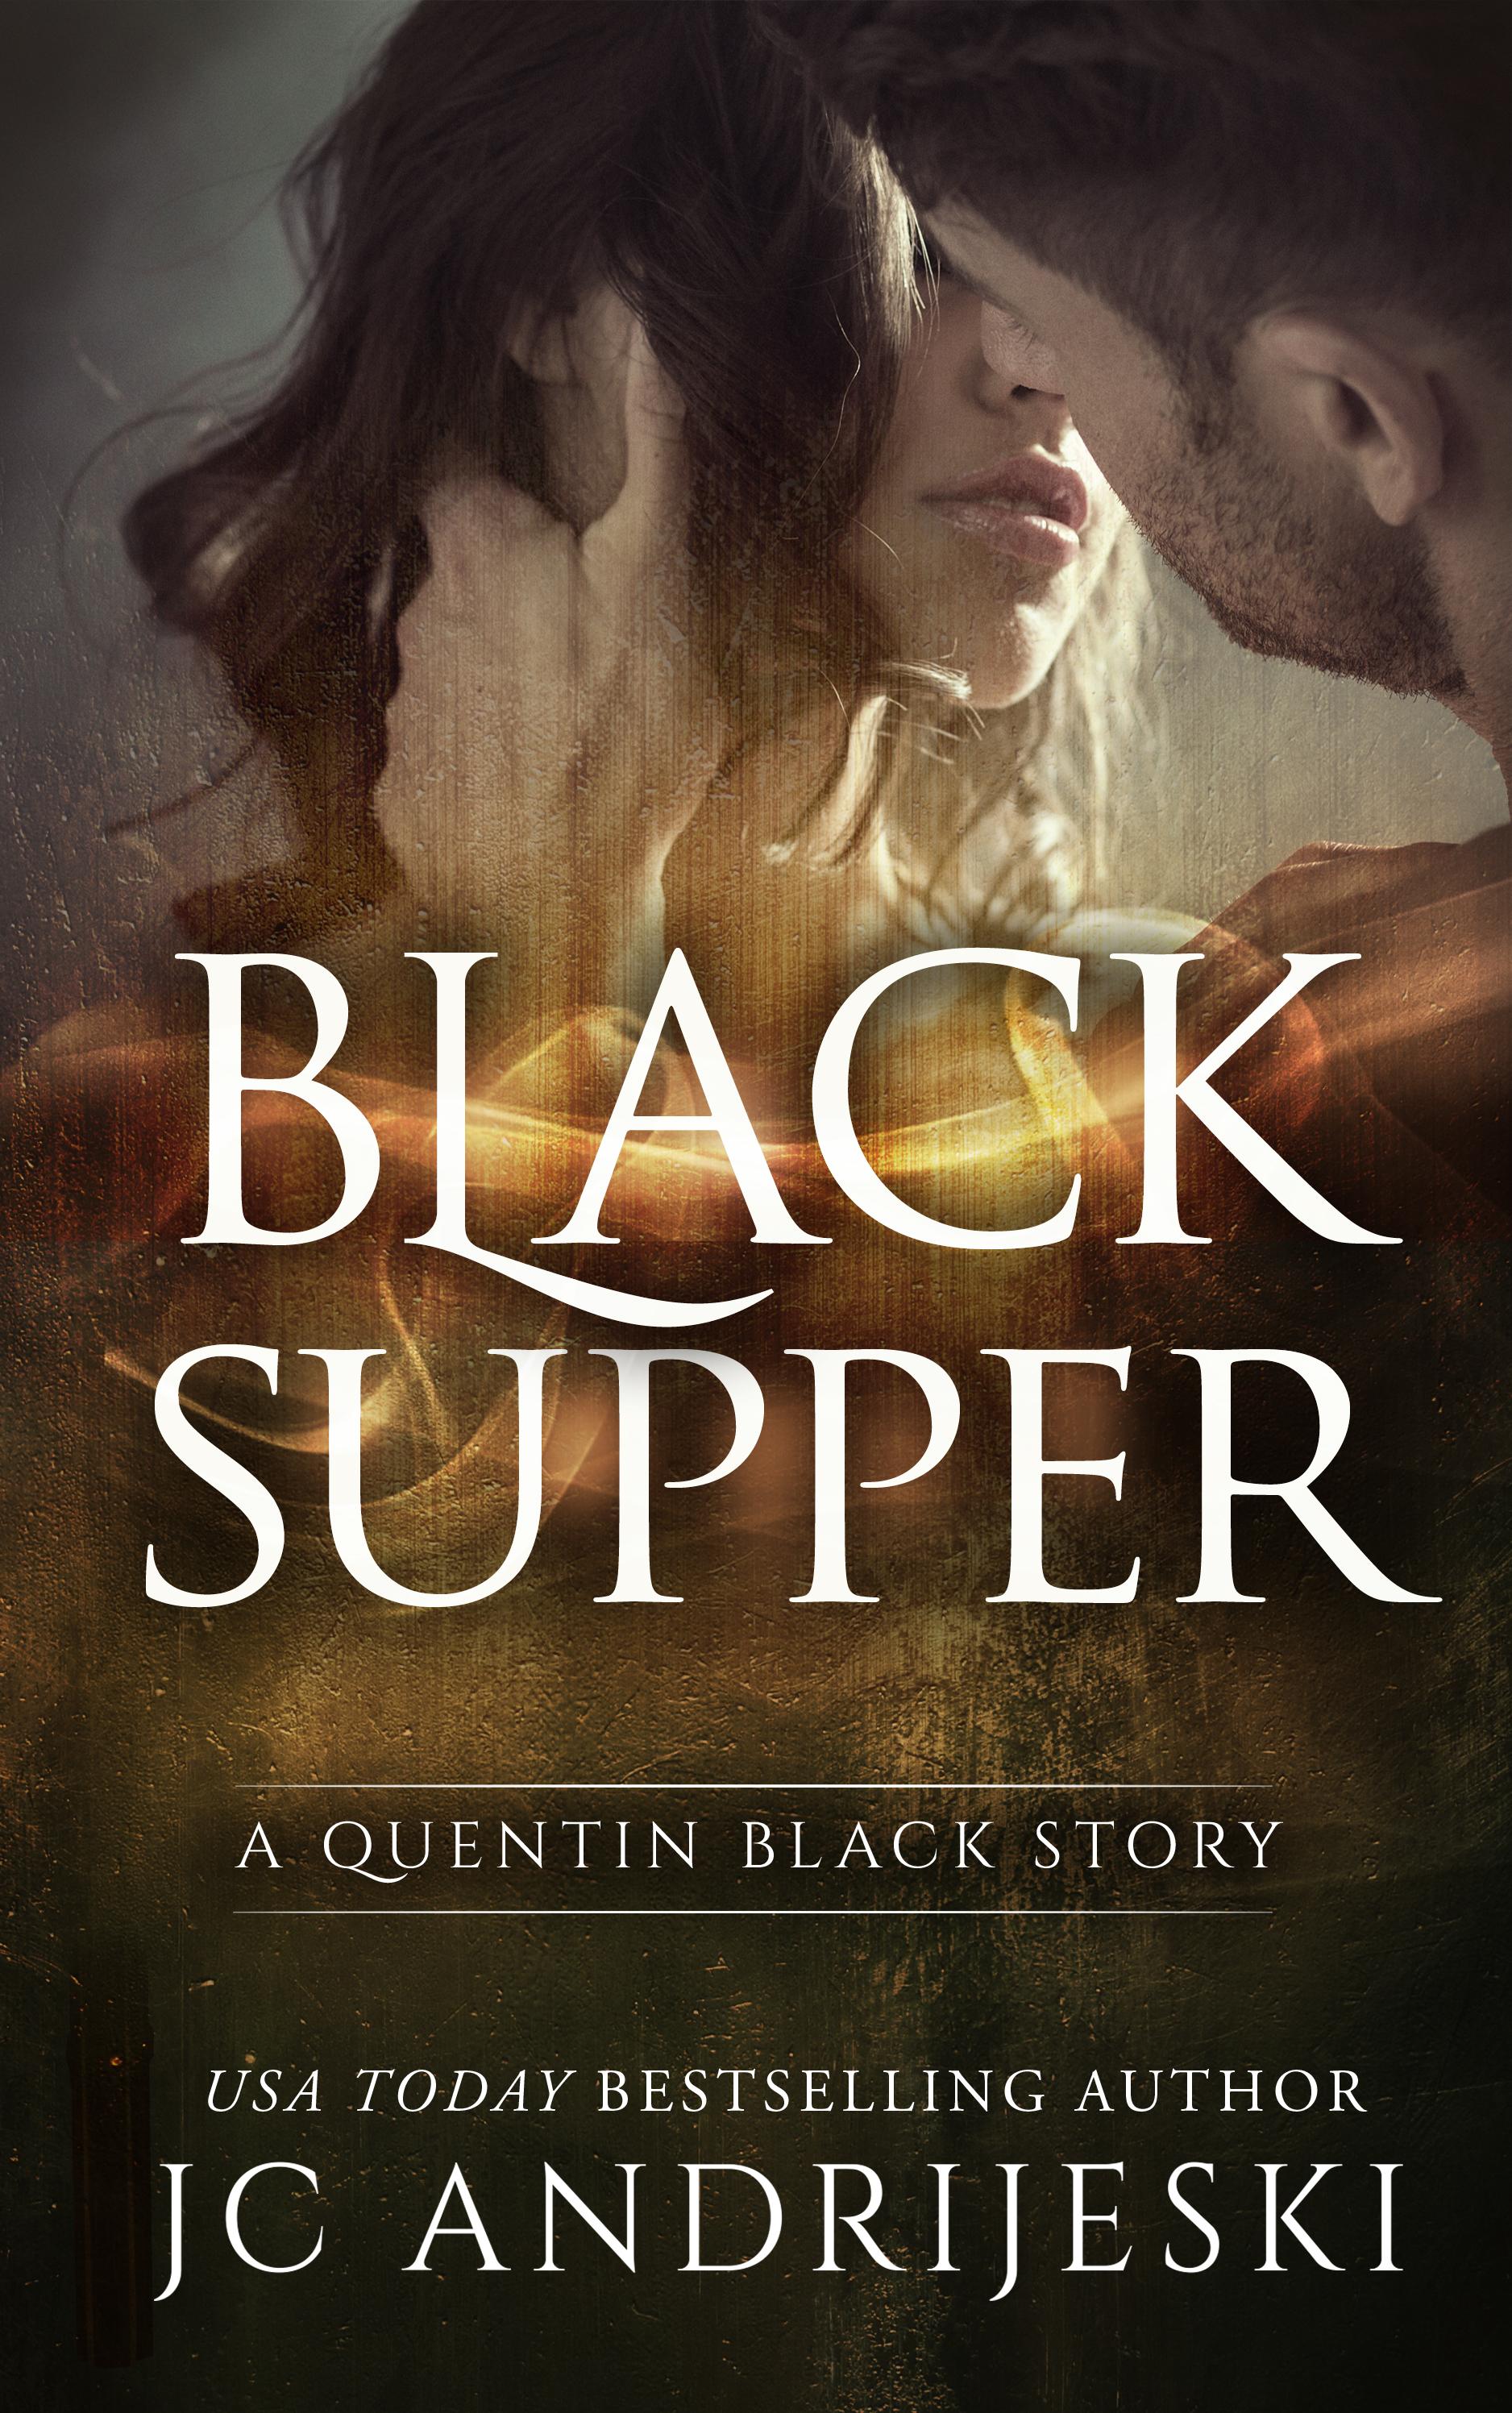 BLACK SUPPER